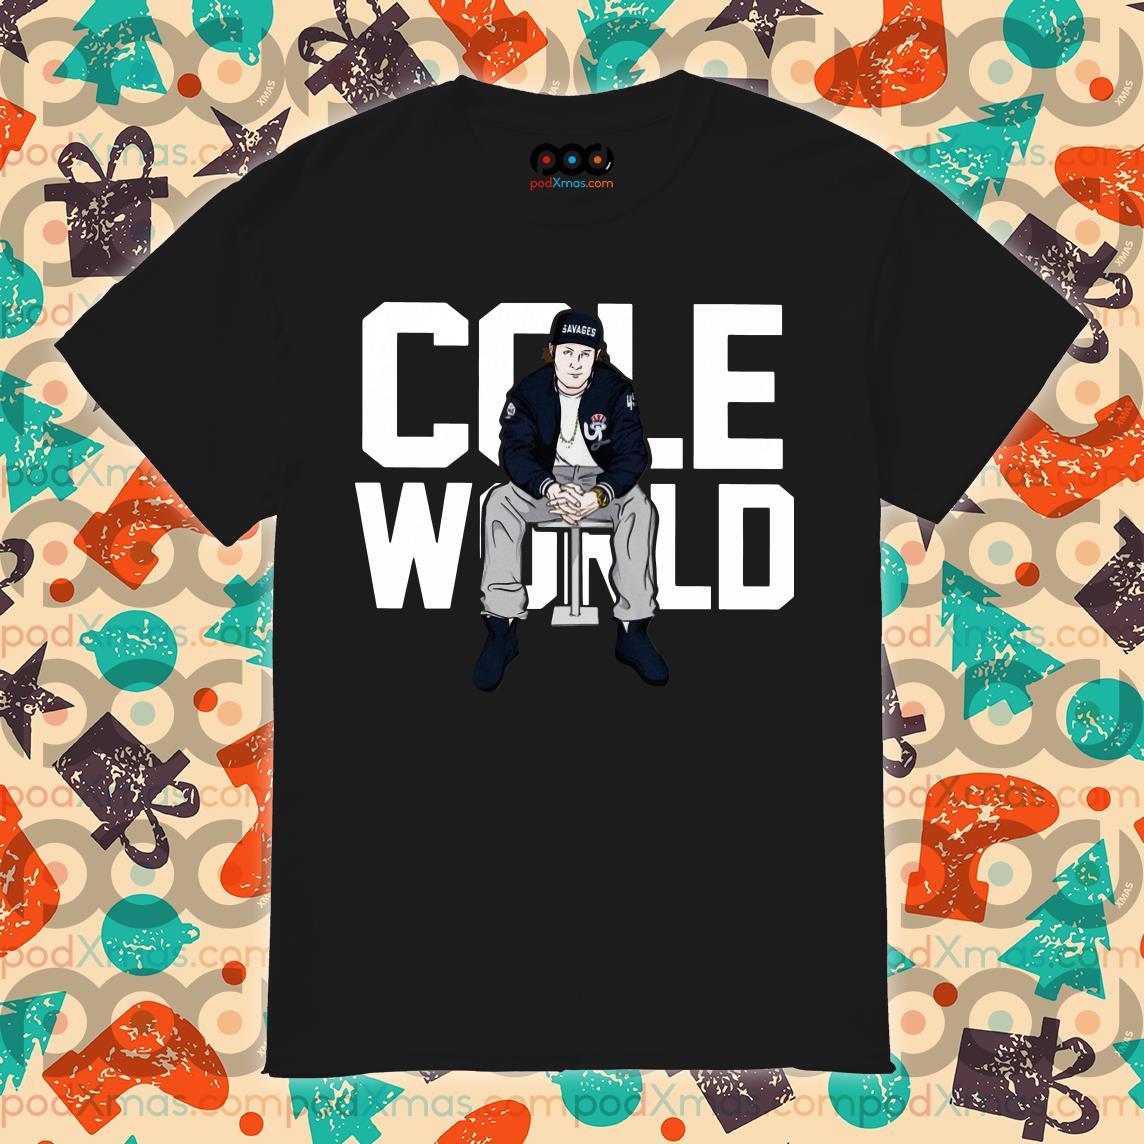 Gerrit Cole World Yankees shirt